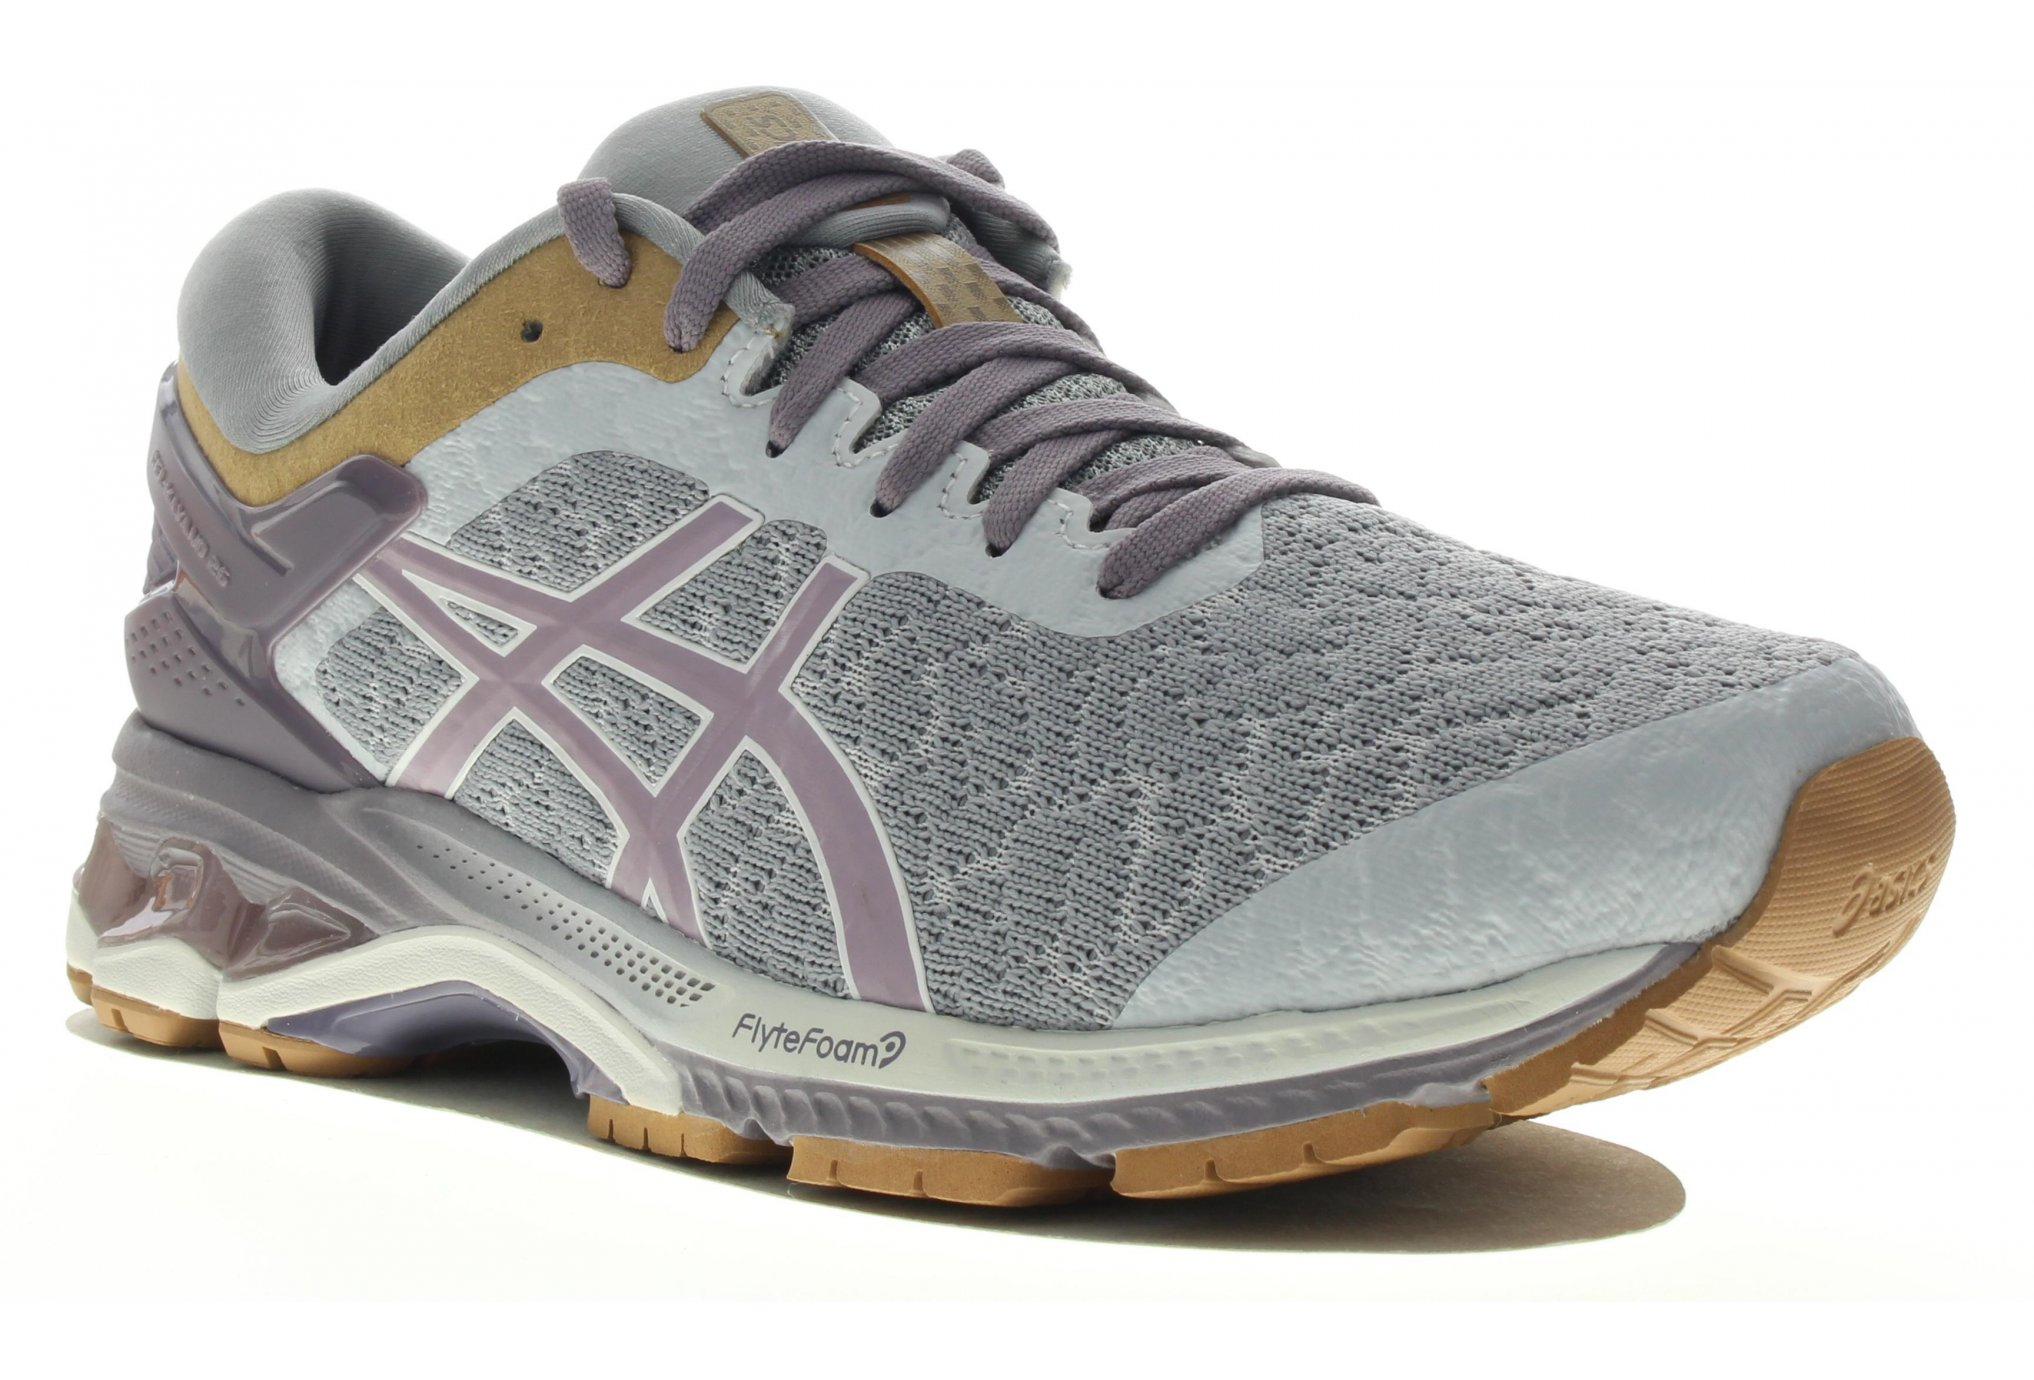 Asics Gel Kayano 26 Chaussures running femme